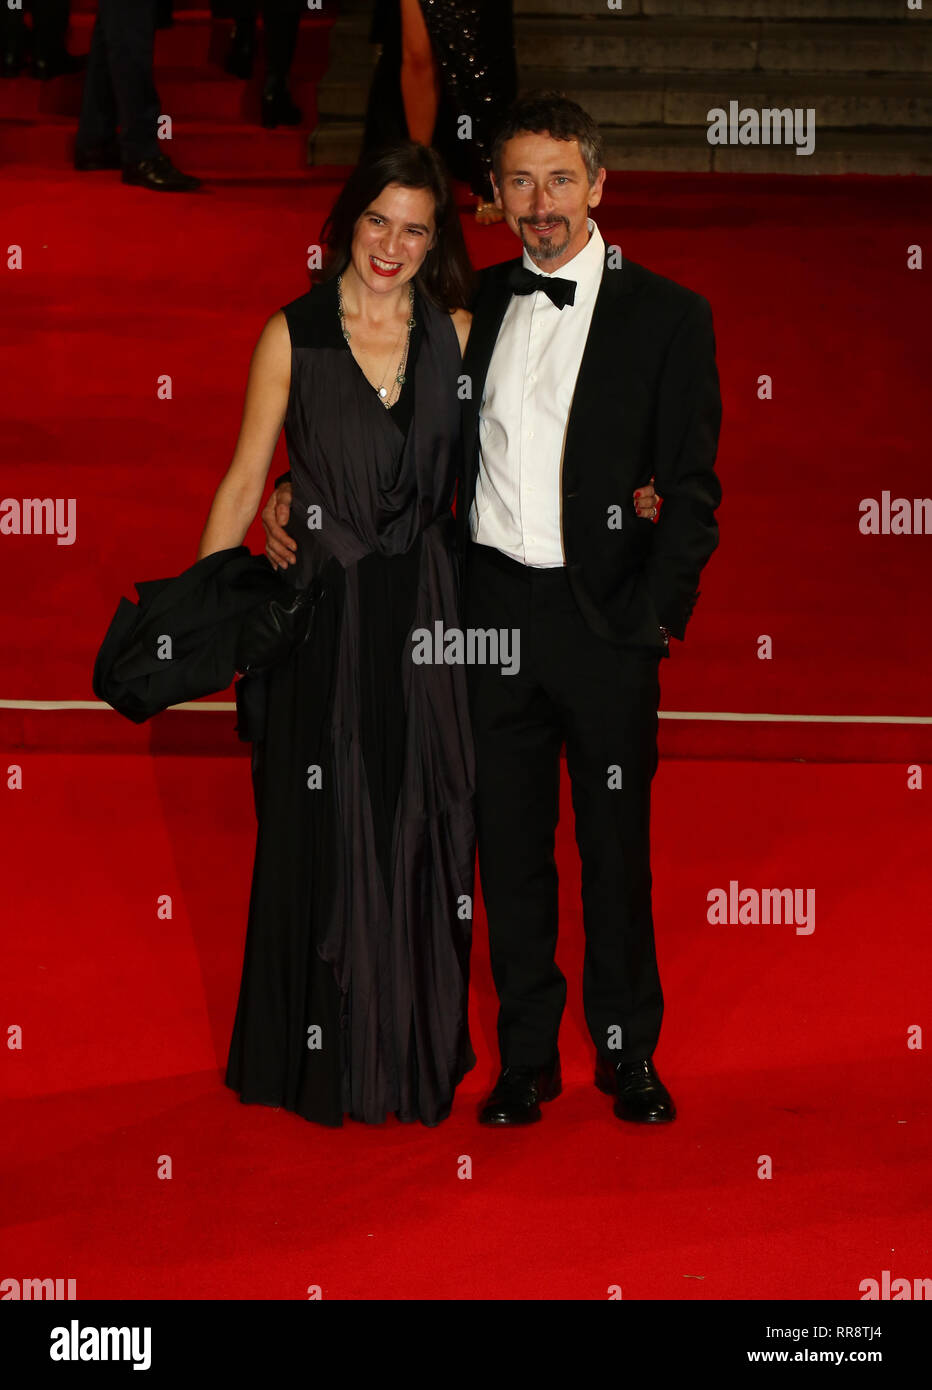 Oct 26, 2015 - London, England, UK -  James Bond Spectre World Premiere held at Royal Albert Hall:- Photo Shows: - Stock Image